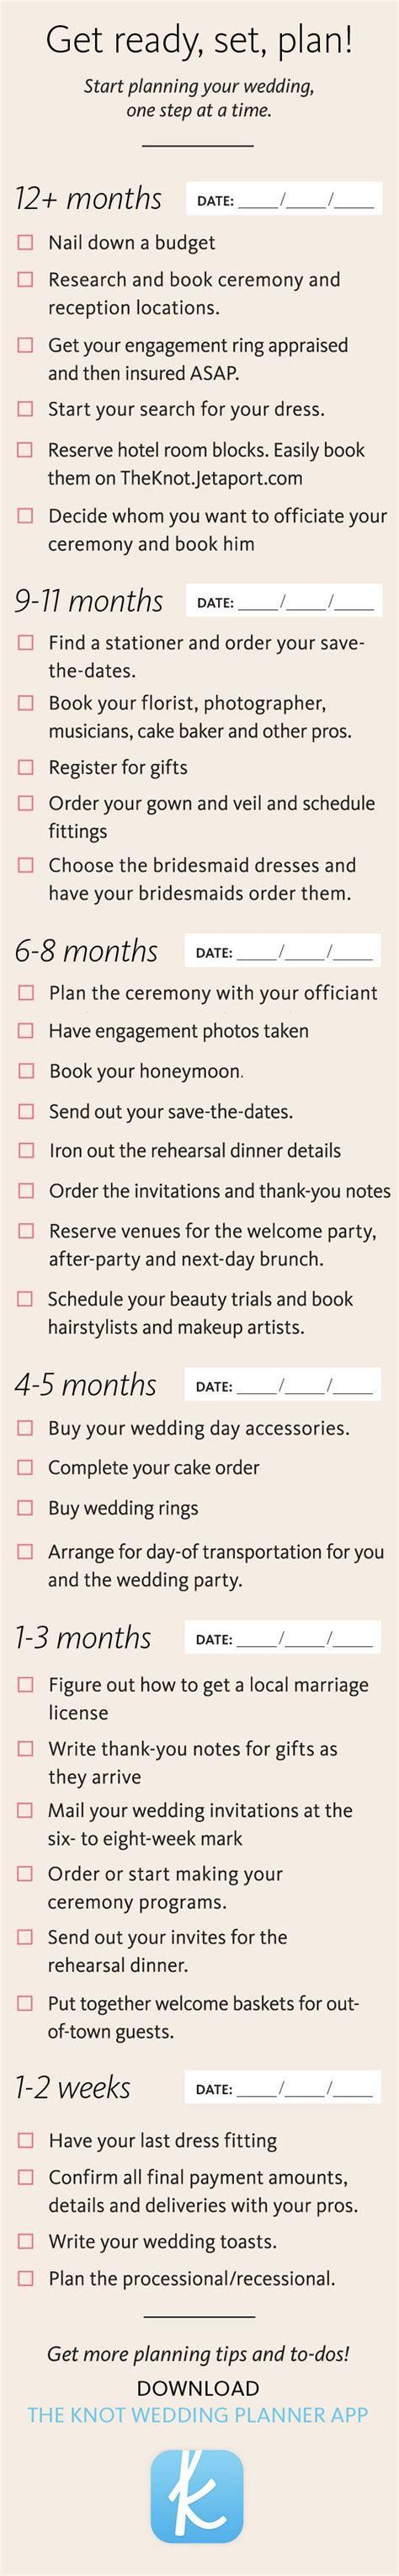 Wedding Planner Services by Stunning Wedding Planner Services List 17 Best Ideas About